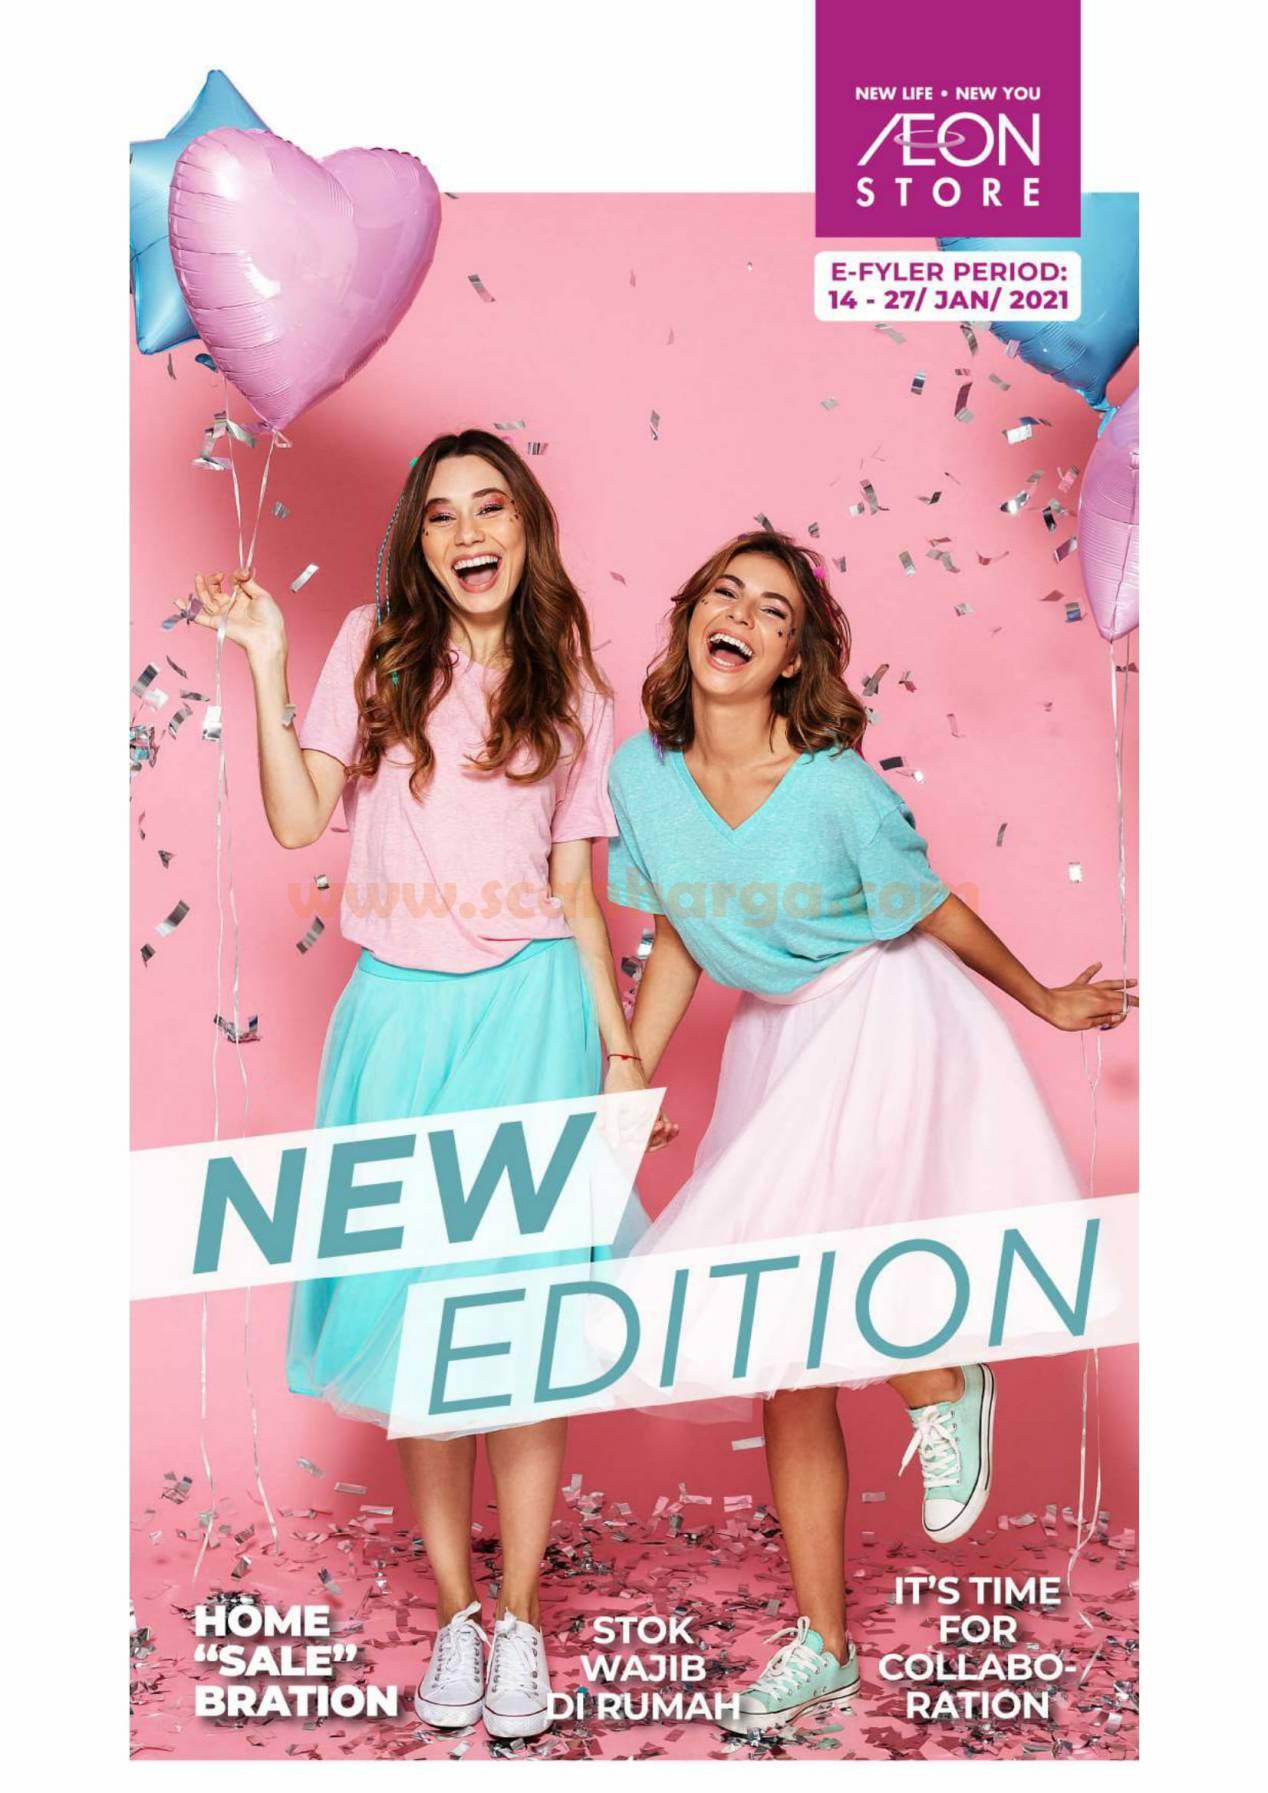 Katalog Promo AEON Store Periode 14 - 27 Januari 2021